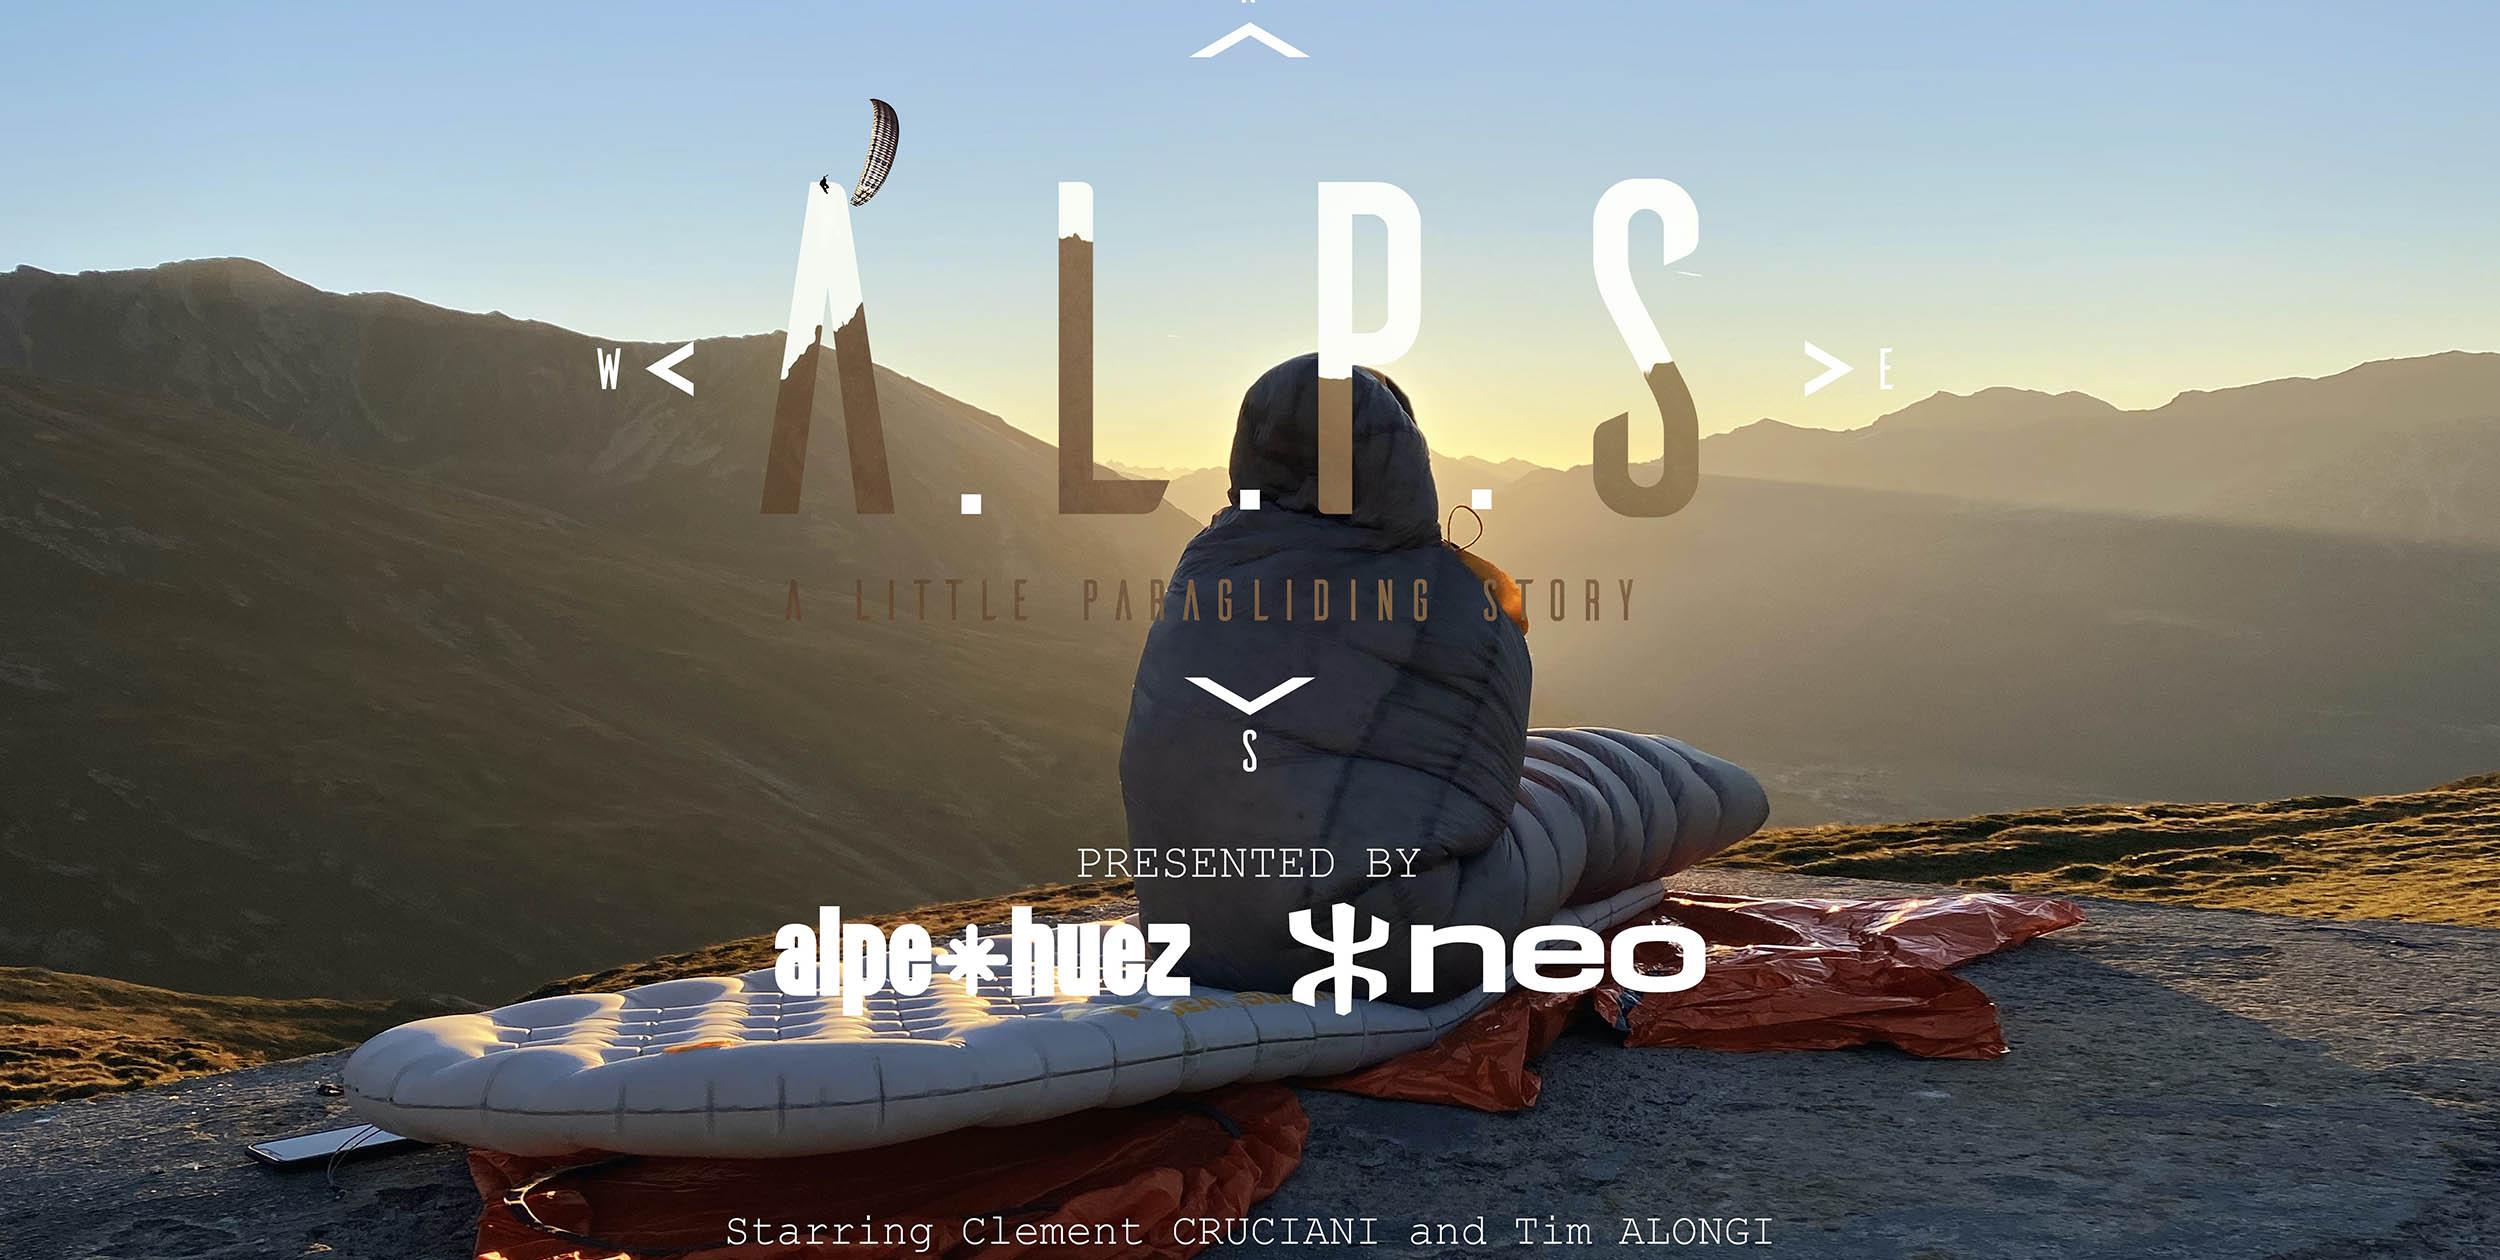 ALPS-vol-bivouac-film